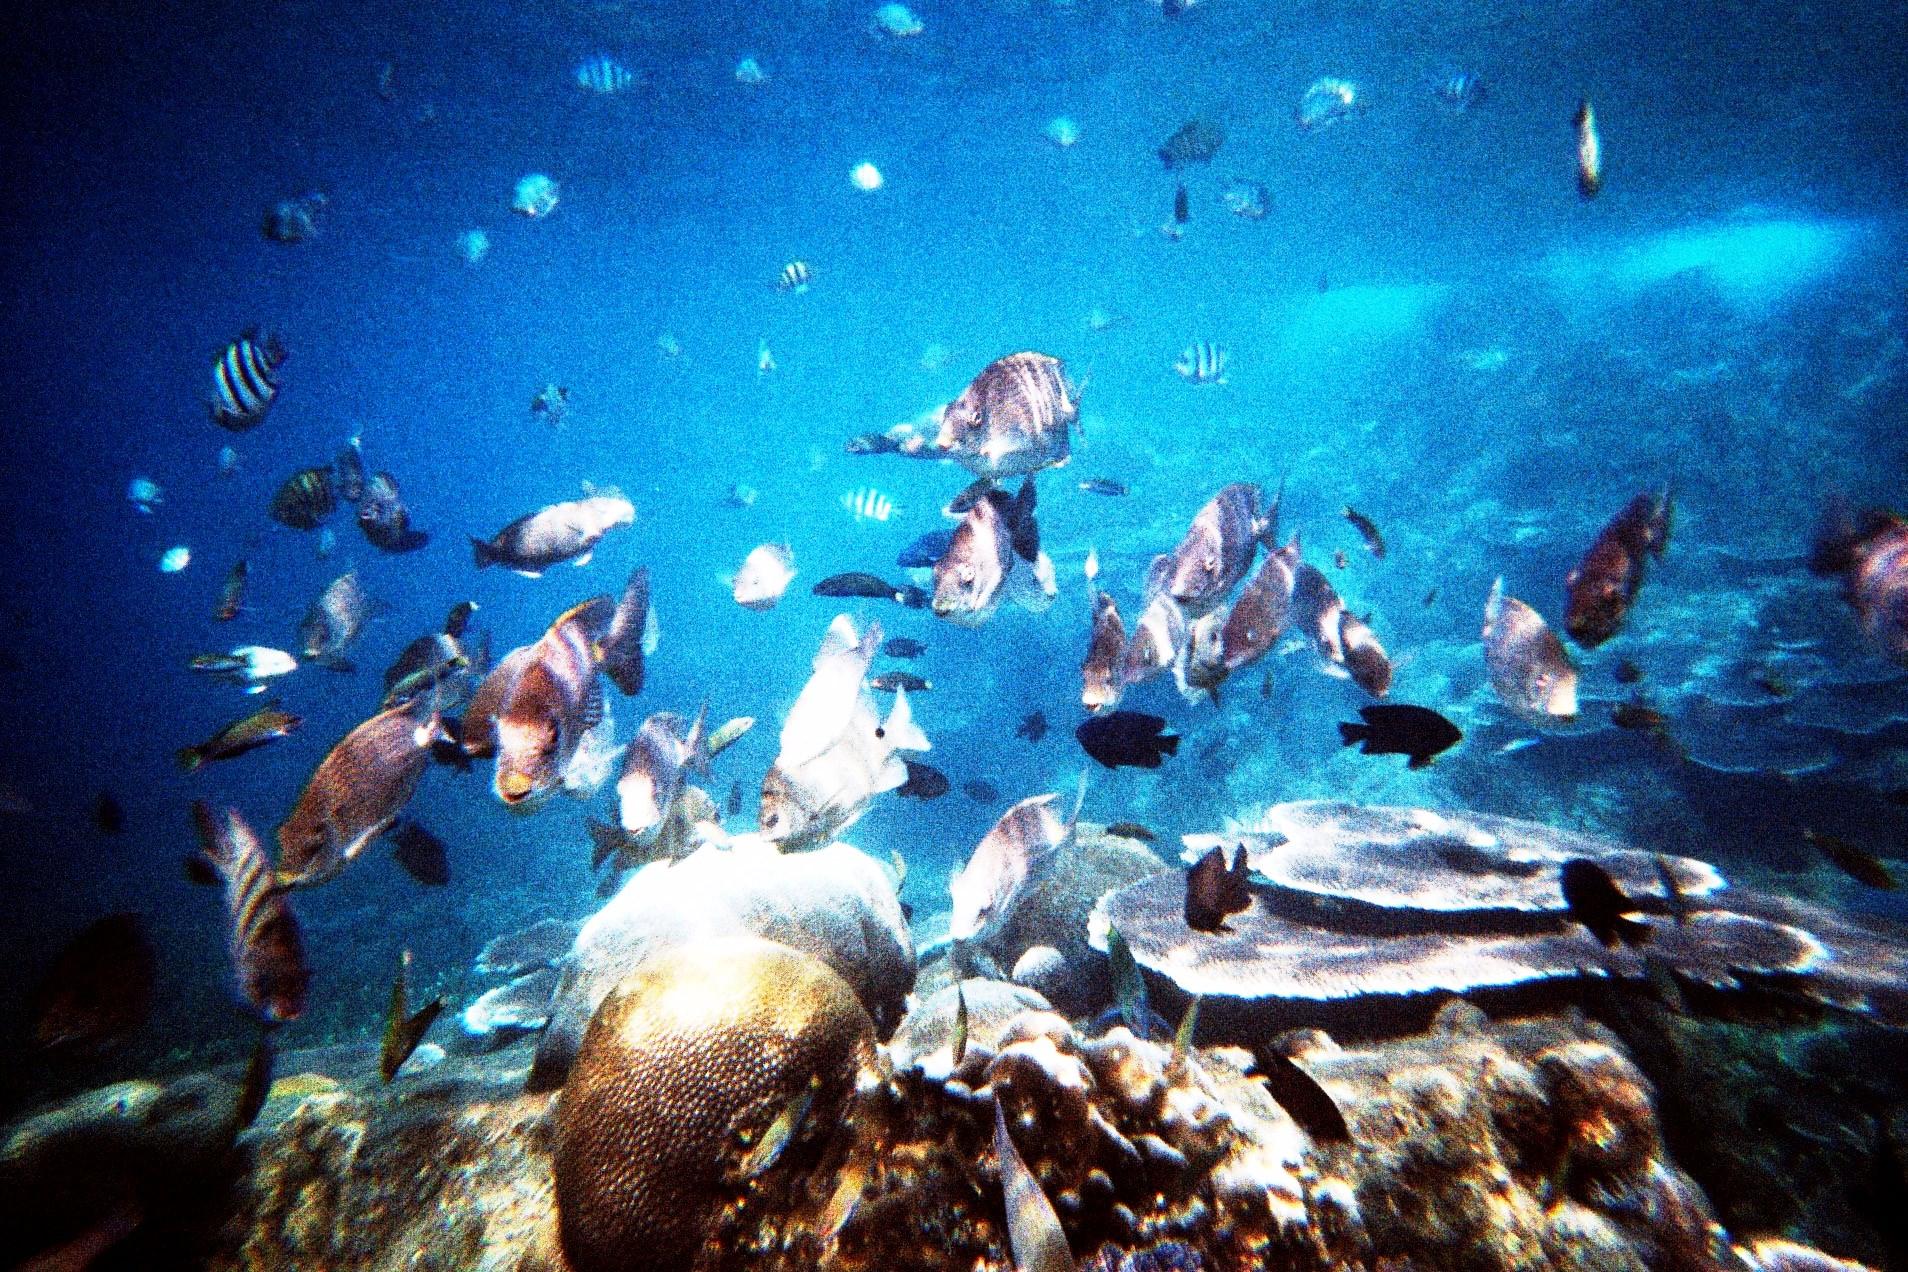 Molucche snorkeling